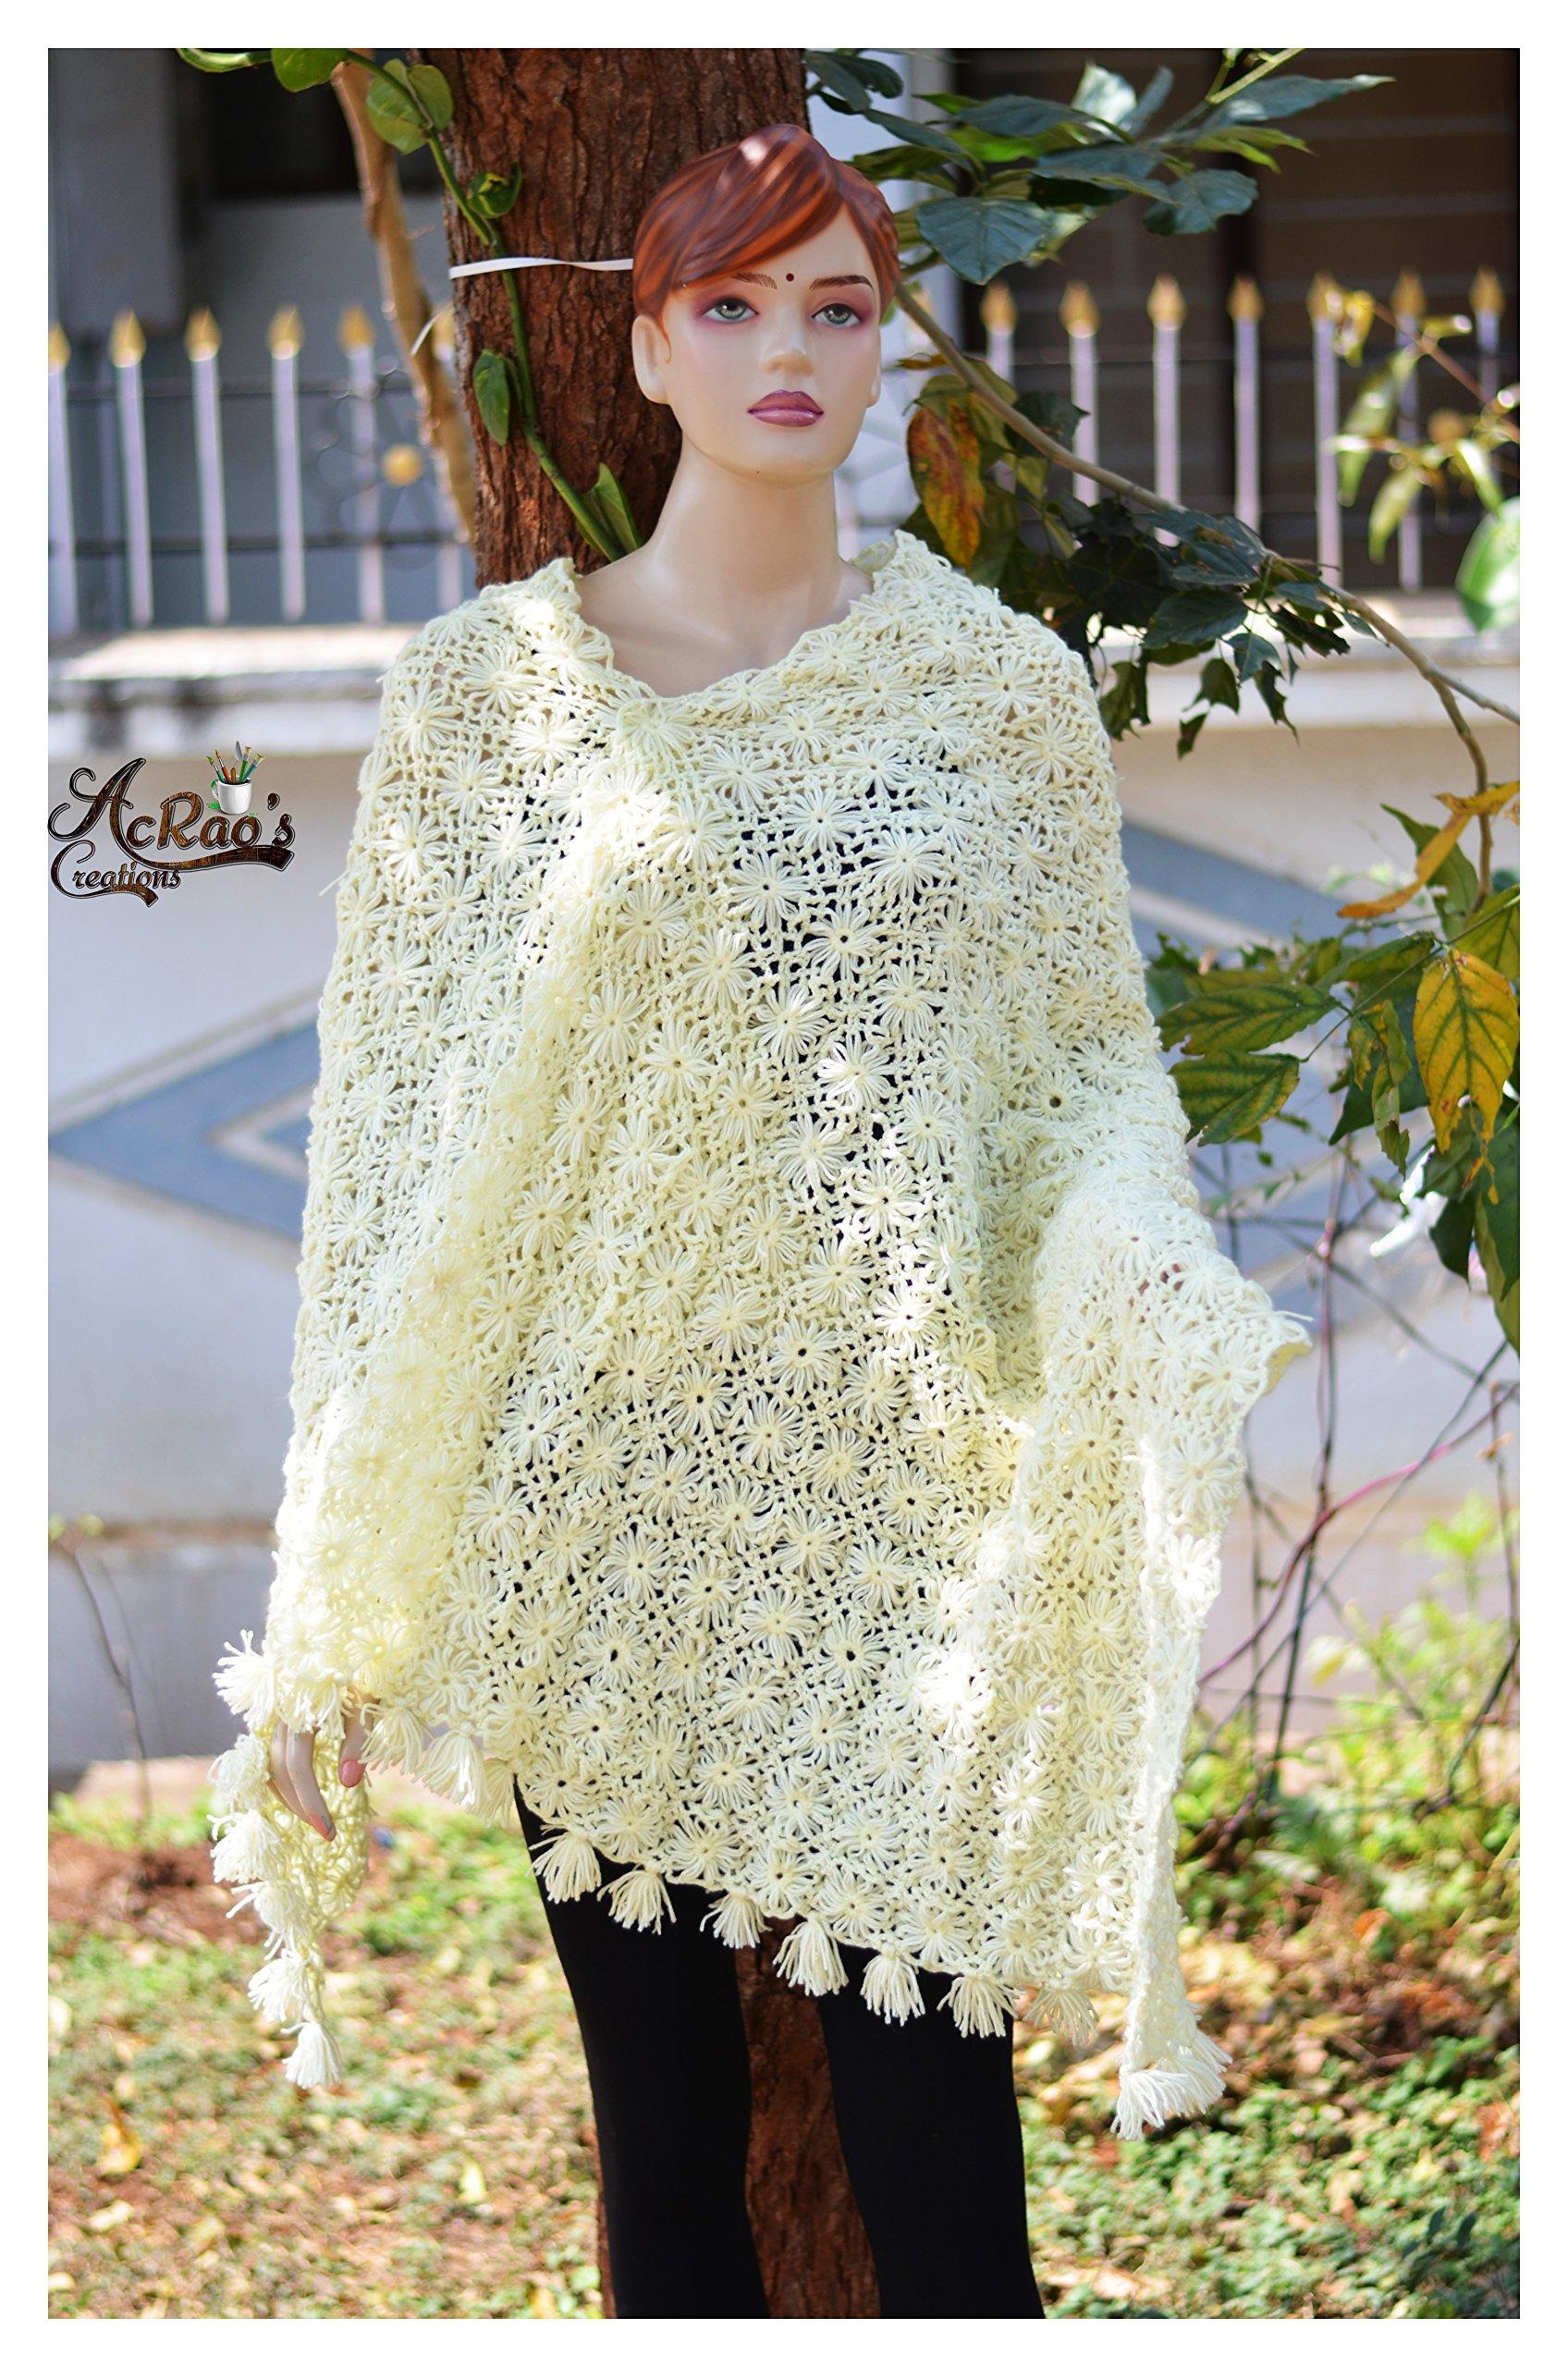 Crochet shawl knitted shawl yellow shawl wedding shawl bride shawl bridesmaid shawl knit shawl poncho wrap hand knit shawl cotton shawl by Acraoscreations